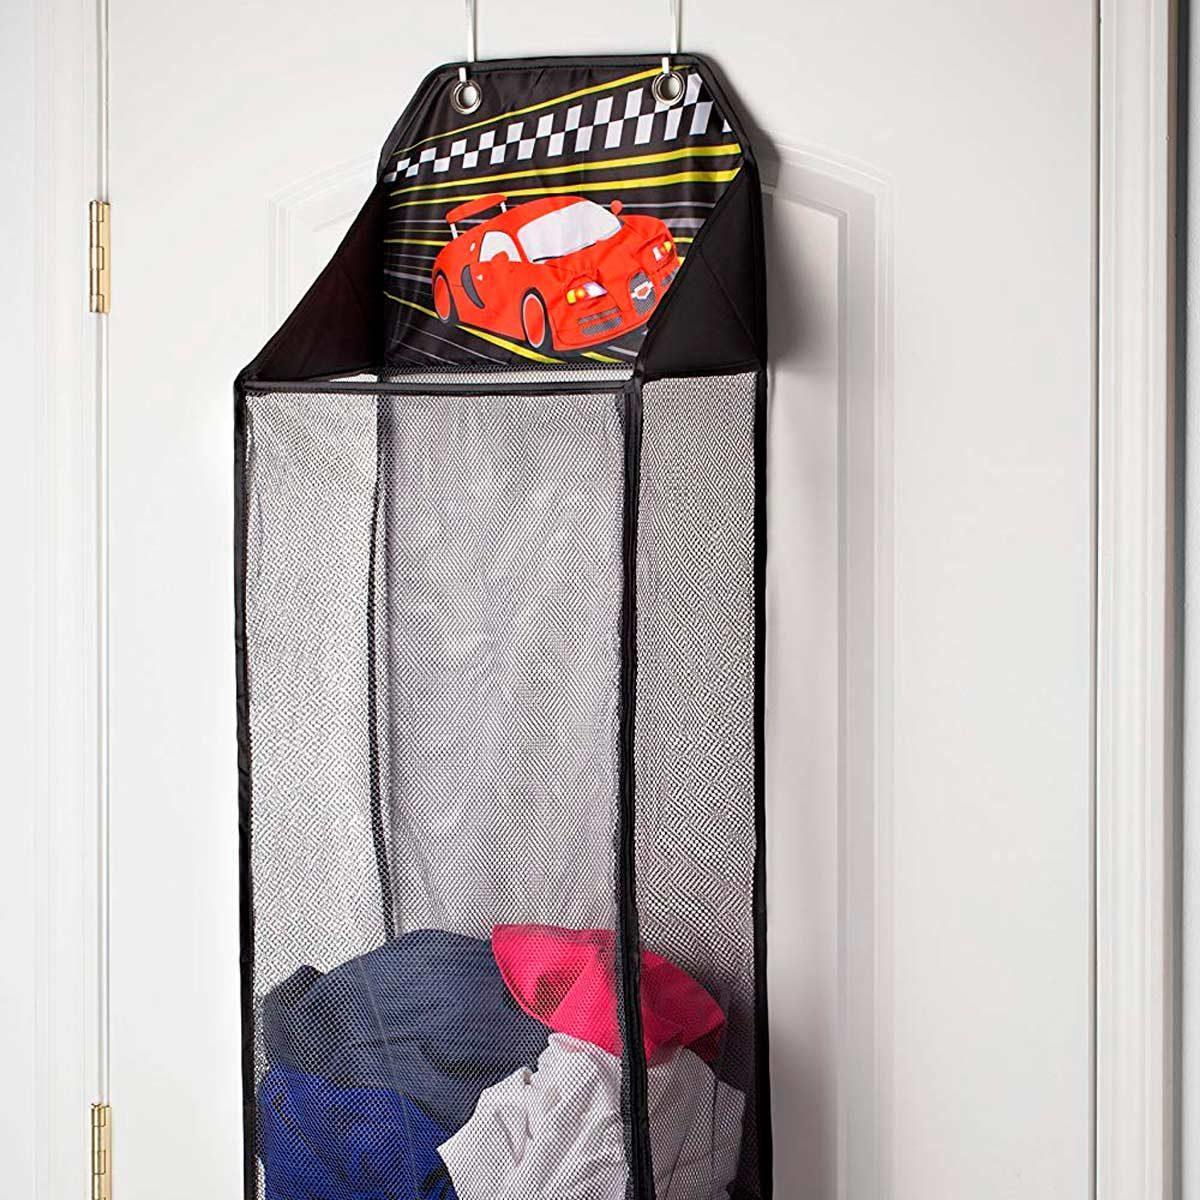 6ed1de650b2b 10 Best Laundry Hampers for Messy Kids   Family Handyman